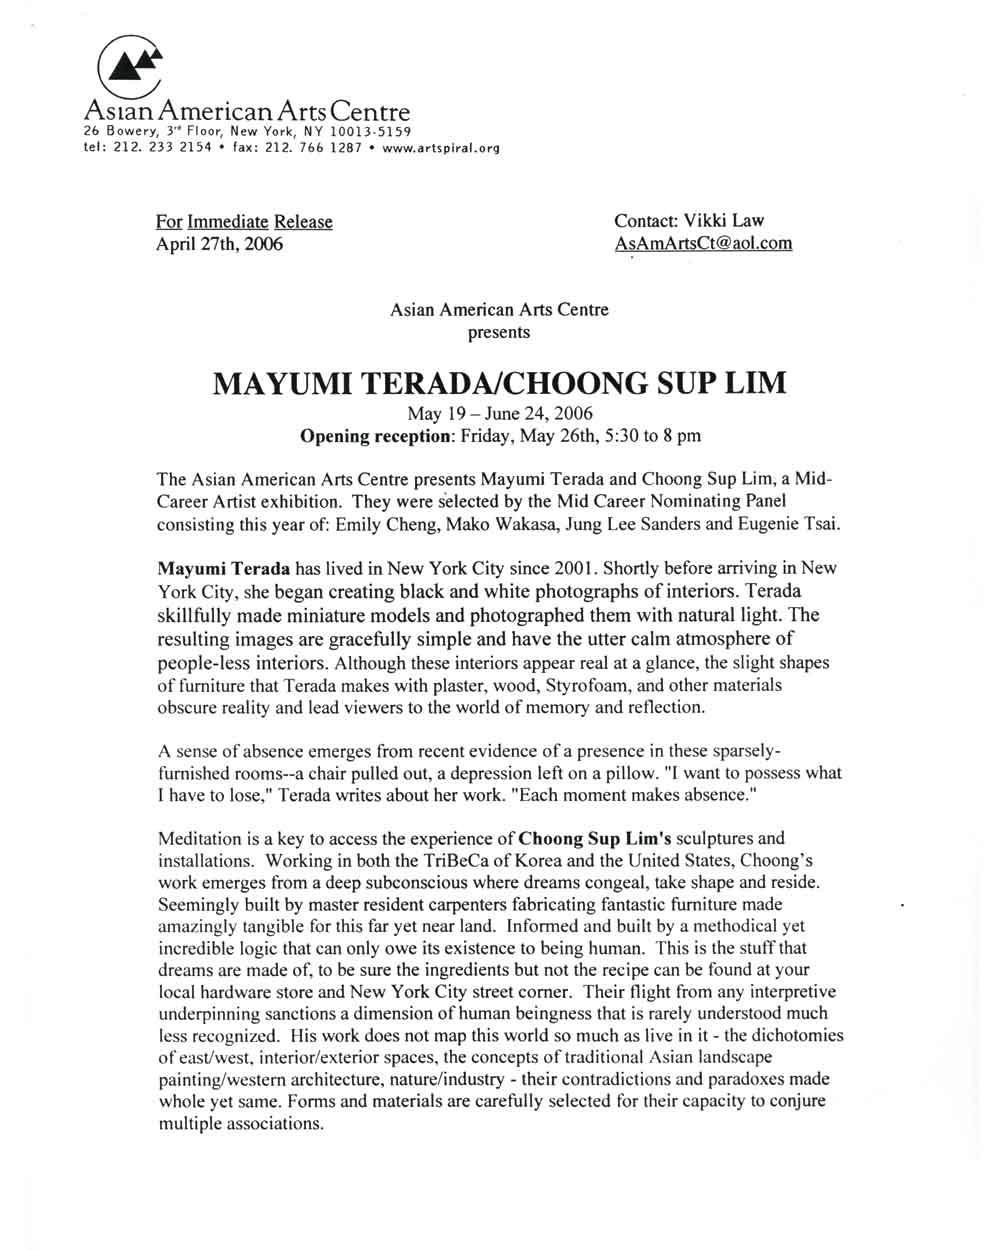 Mayumi Terada/Choong Sup Lim, press release, pg 1